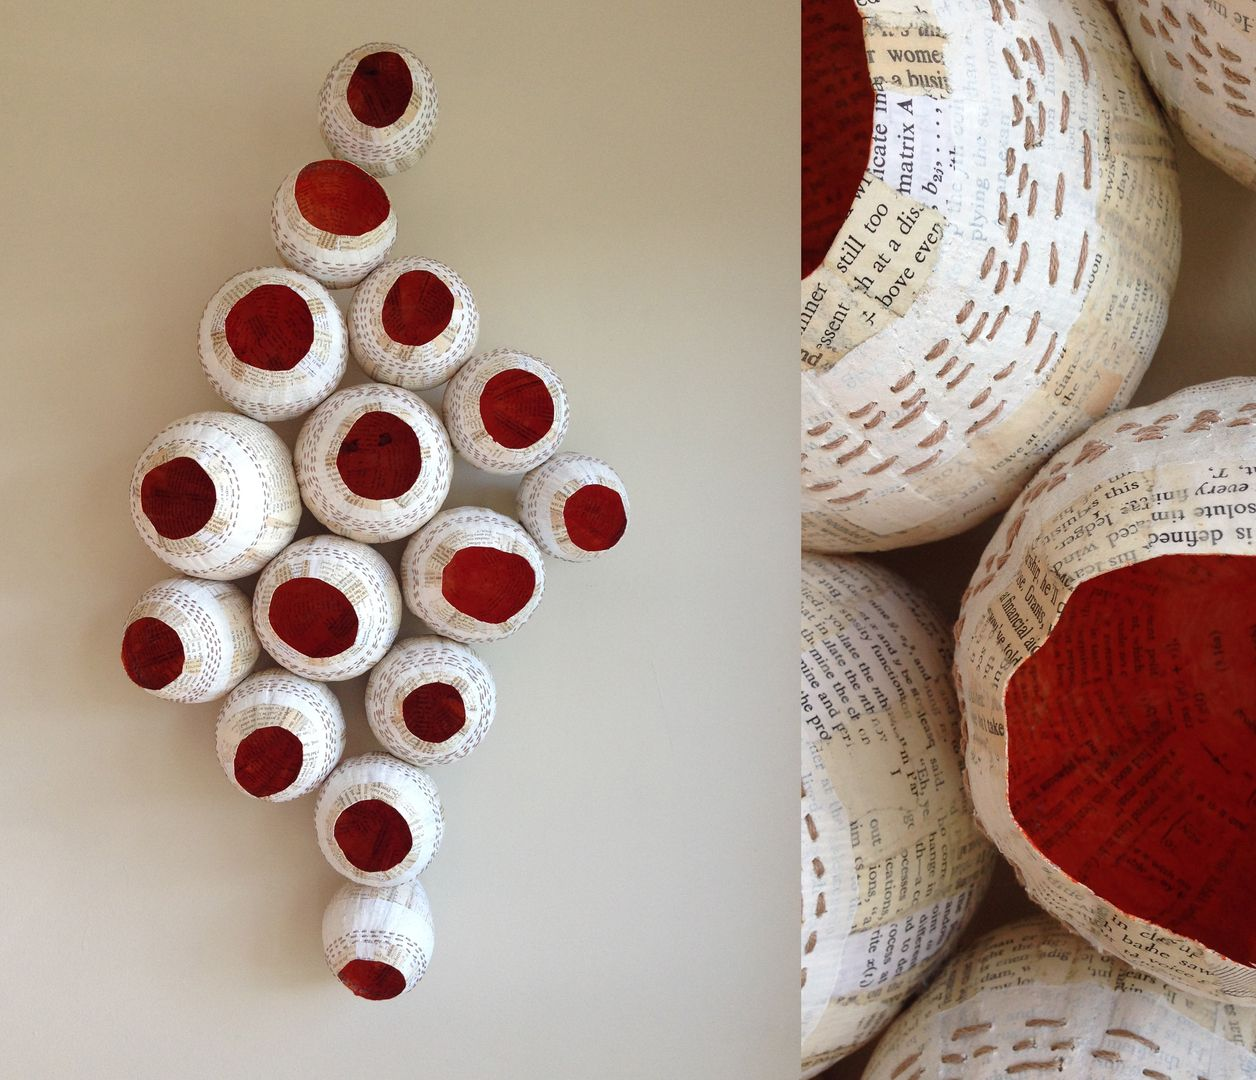 assemblage book sculptures skulpturen plastiken pinterest. Black Bedroom Furniture Sets. Home Design Ideas